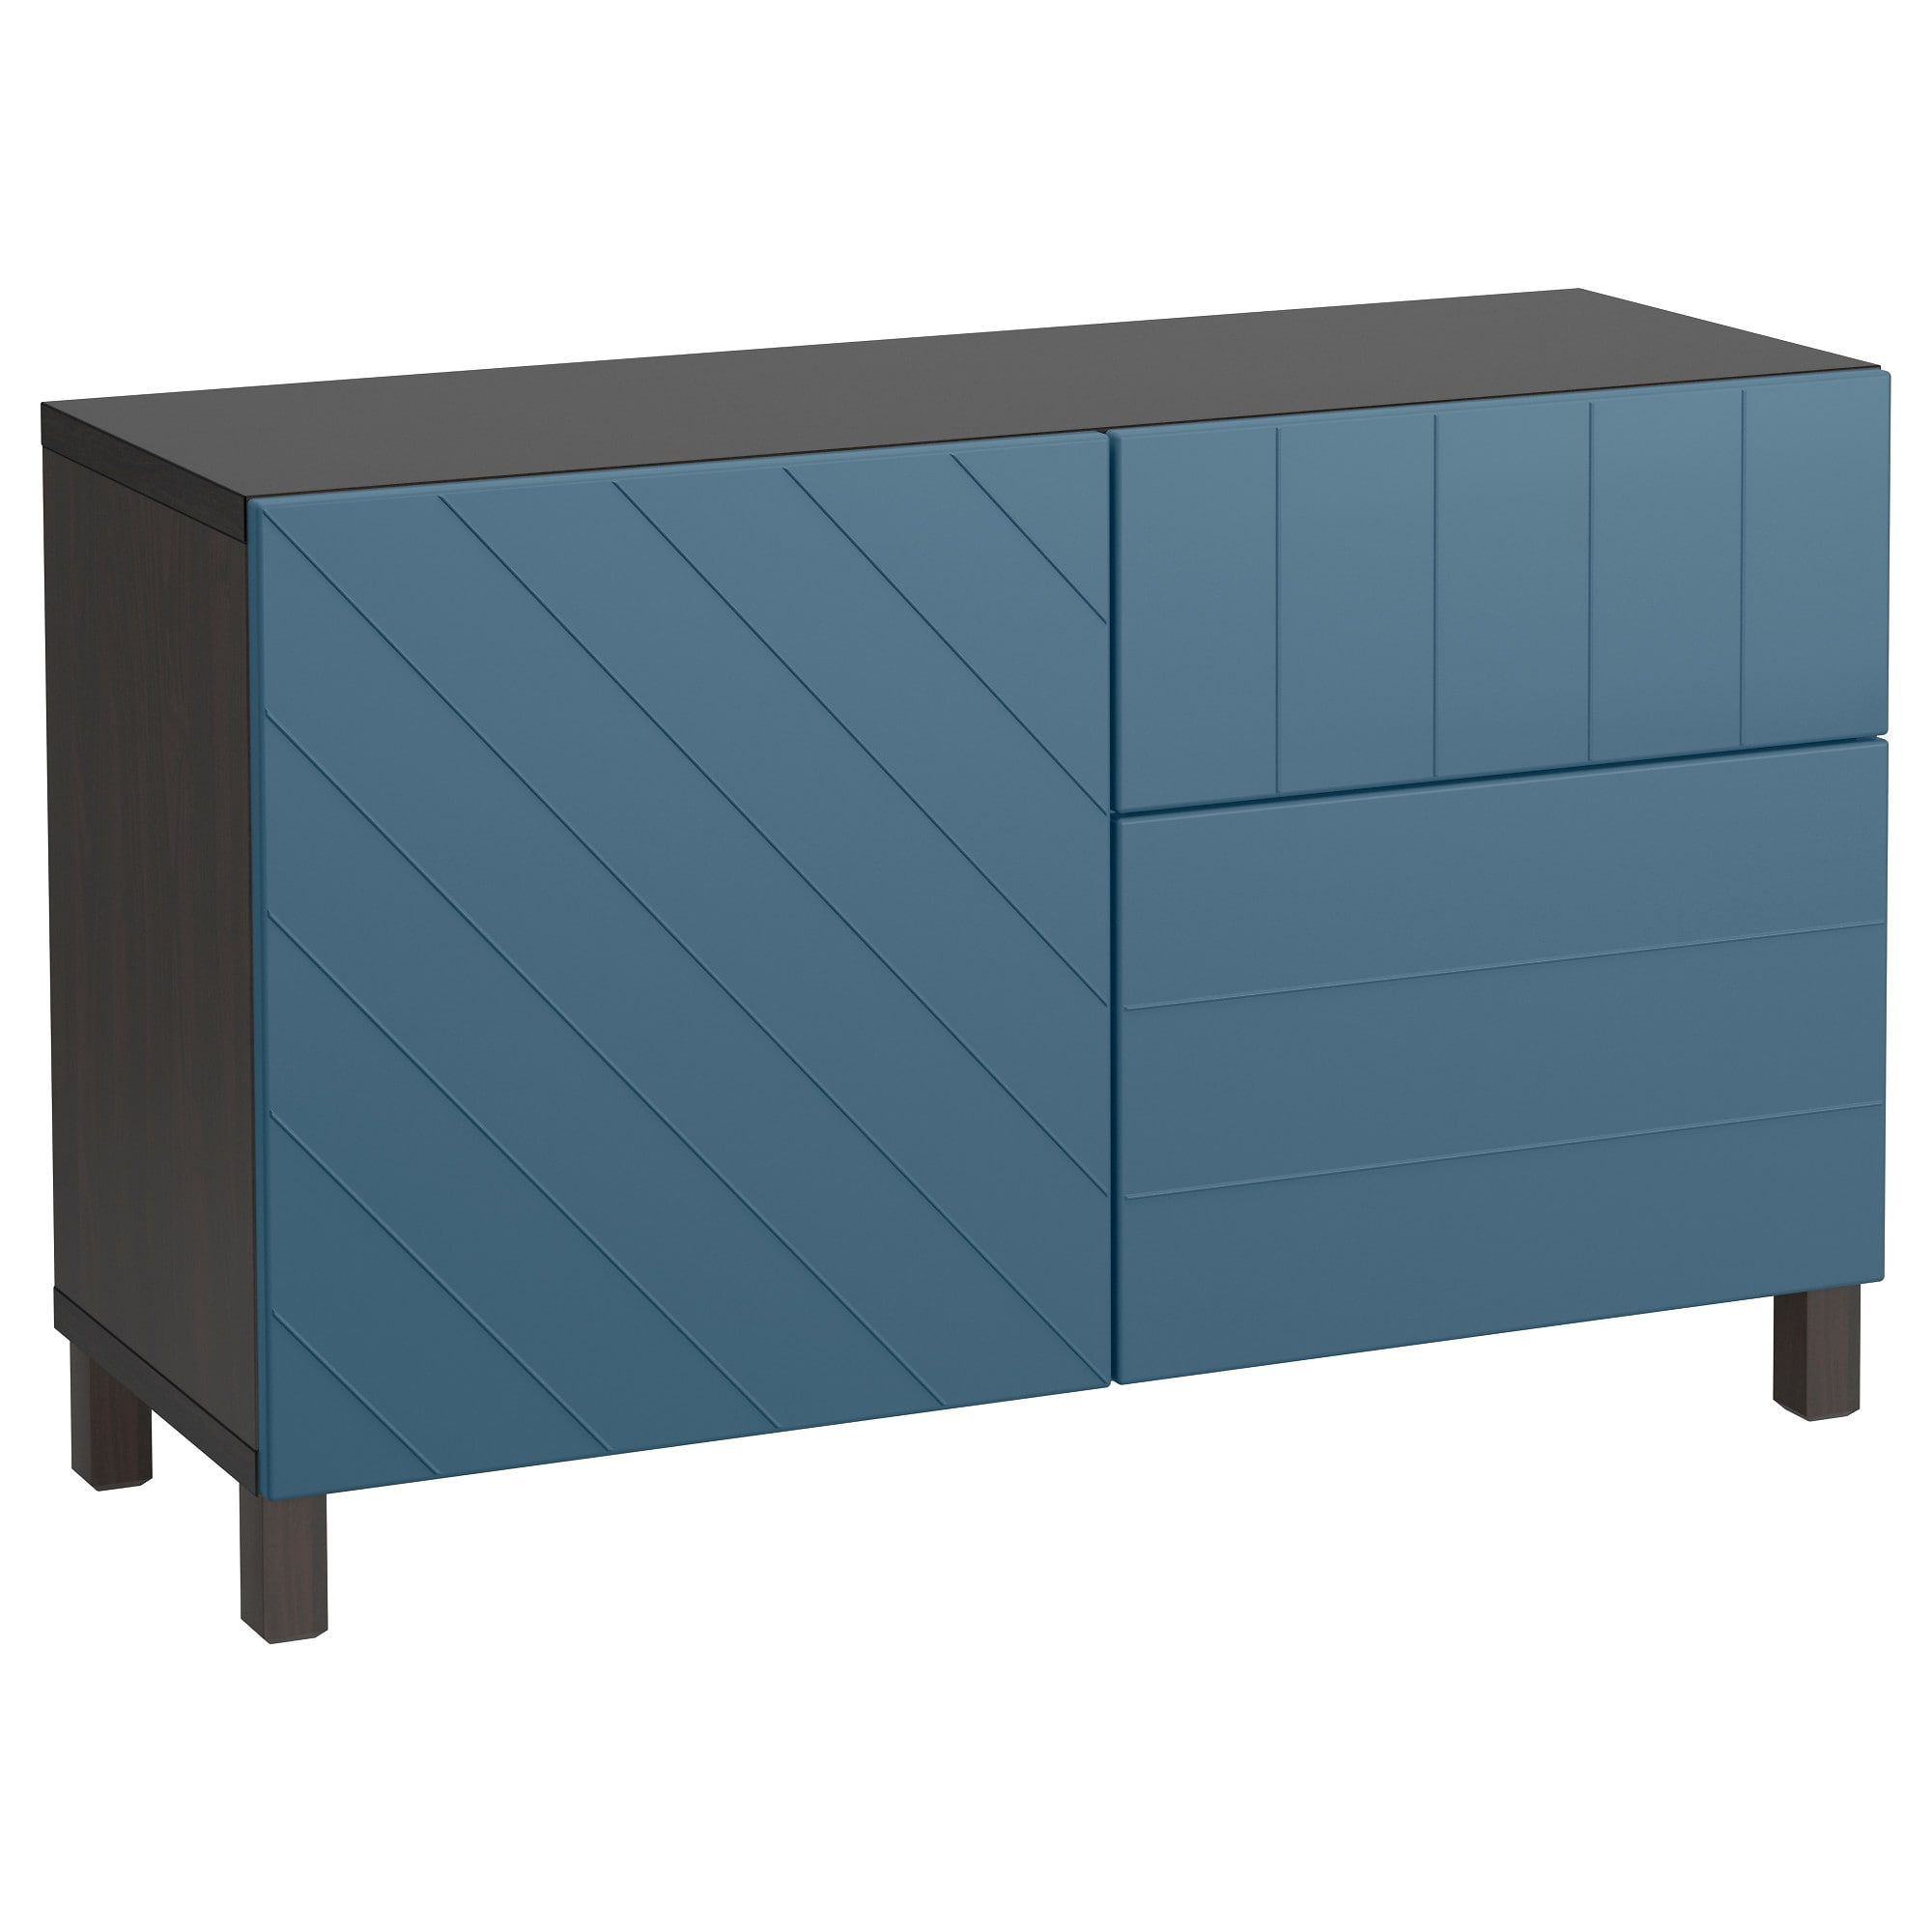 Mueble Consola Ikea T8dj Armarios Aparadores Para Salà N O Edor Pra Online Ikea